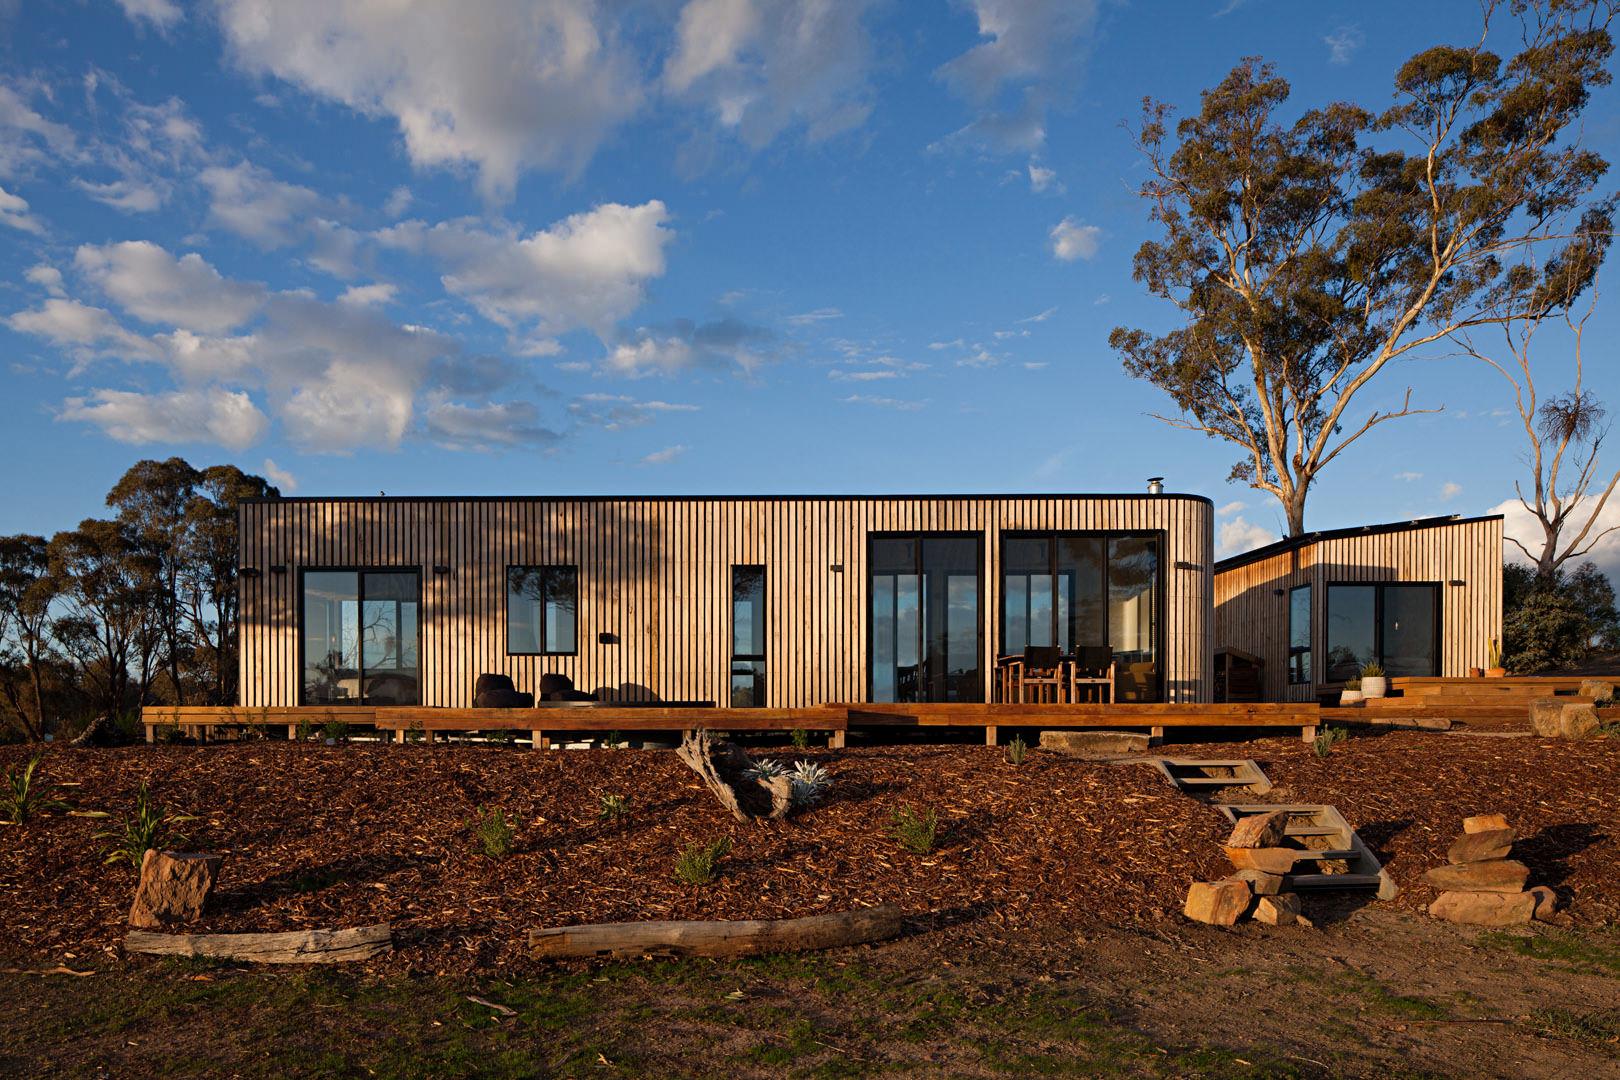 Modular home design by Adjaye Associates for Cube Haus